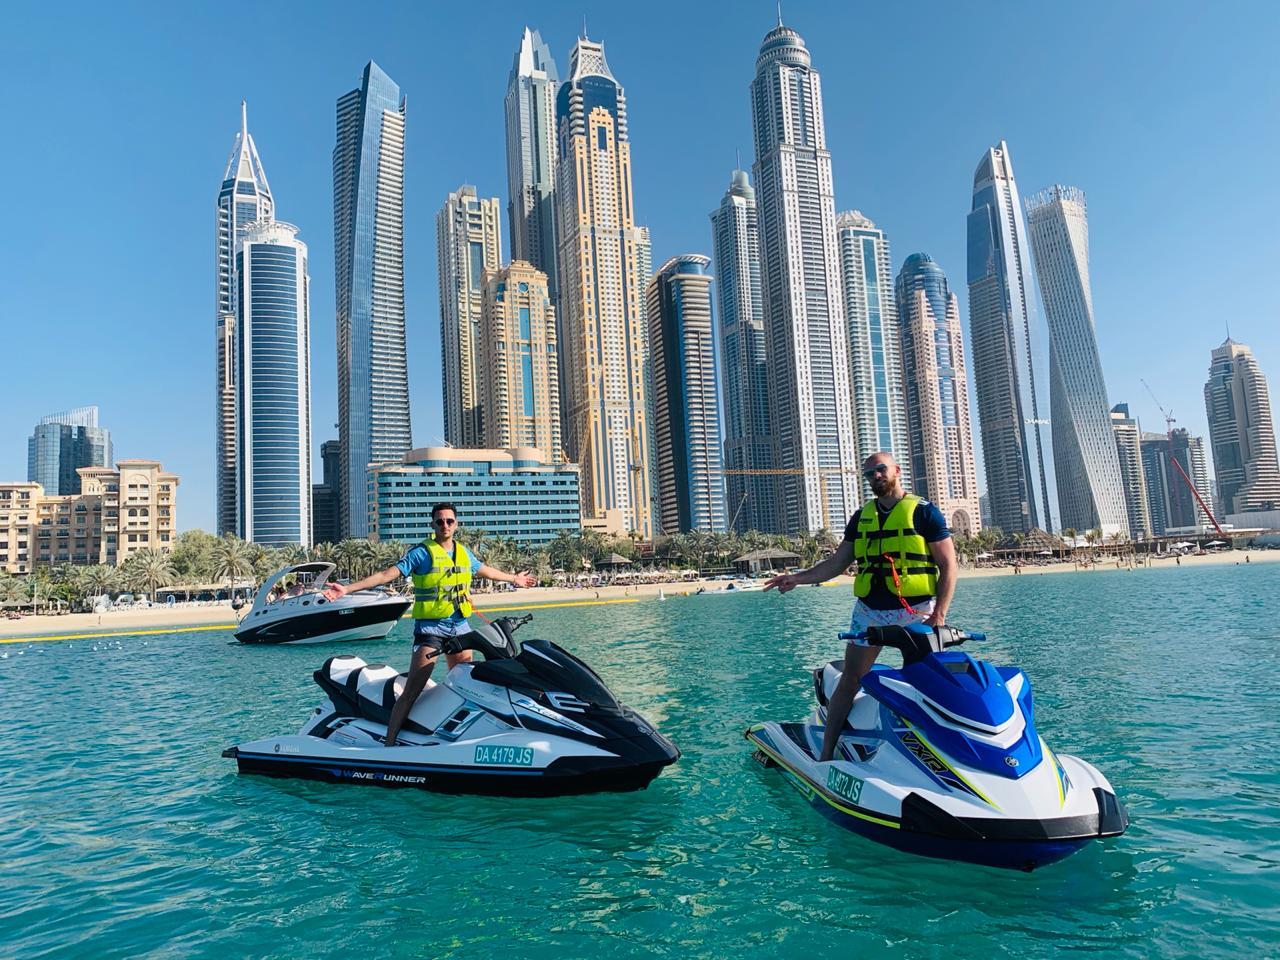 jet ski stop at Dubai Marina